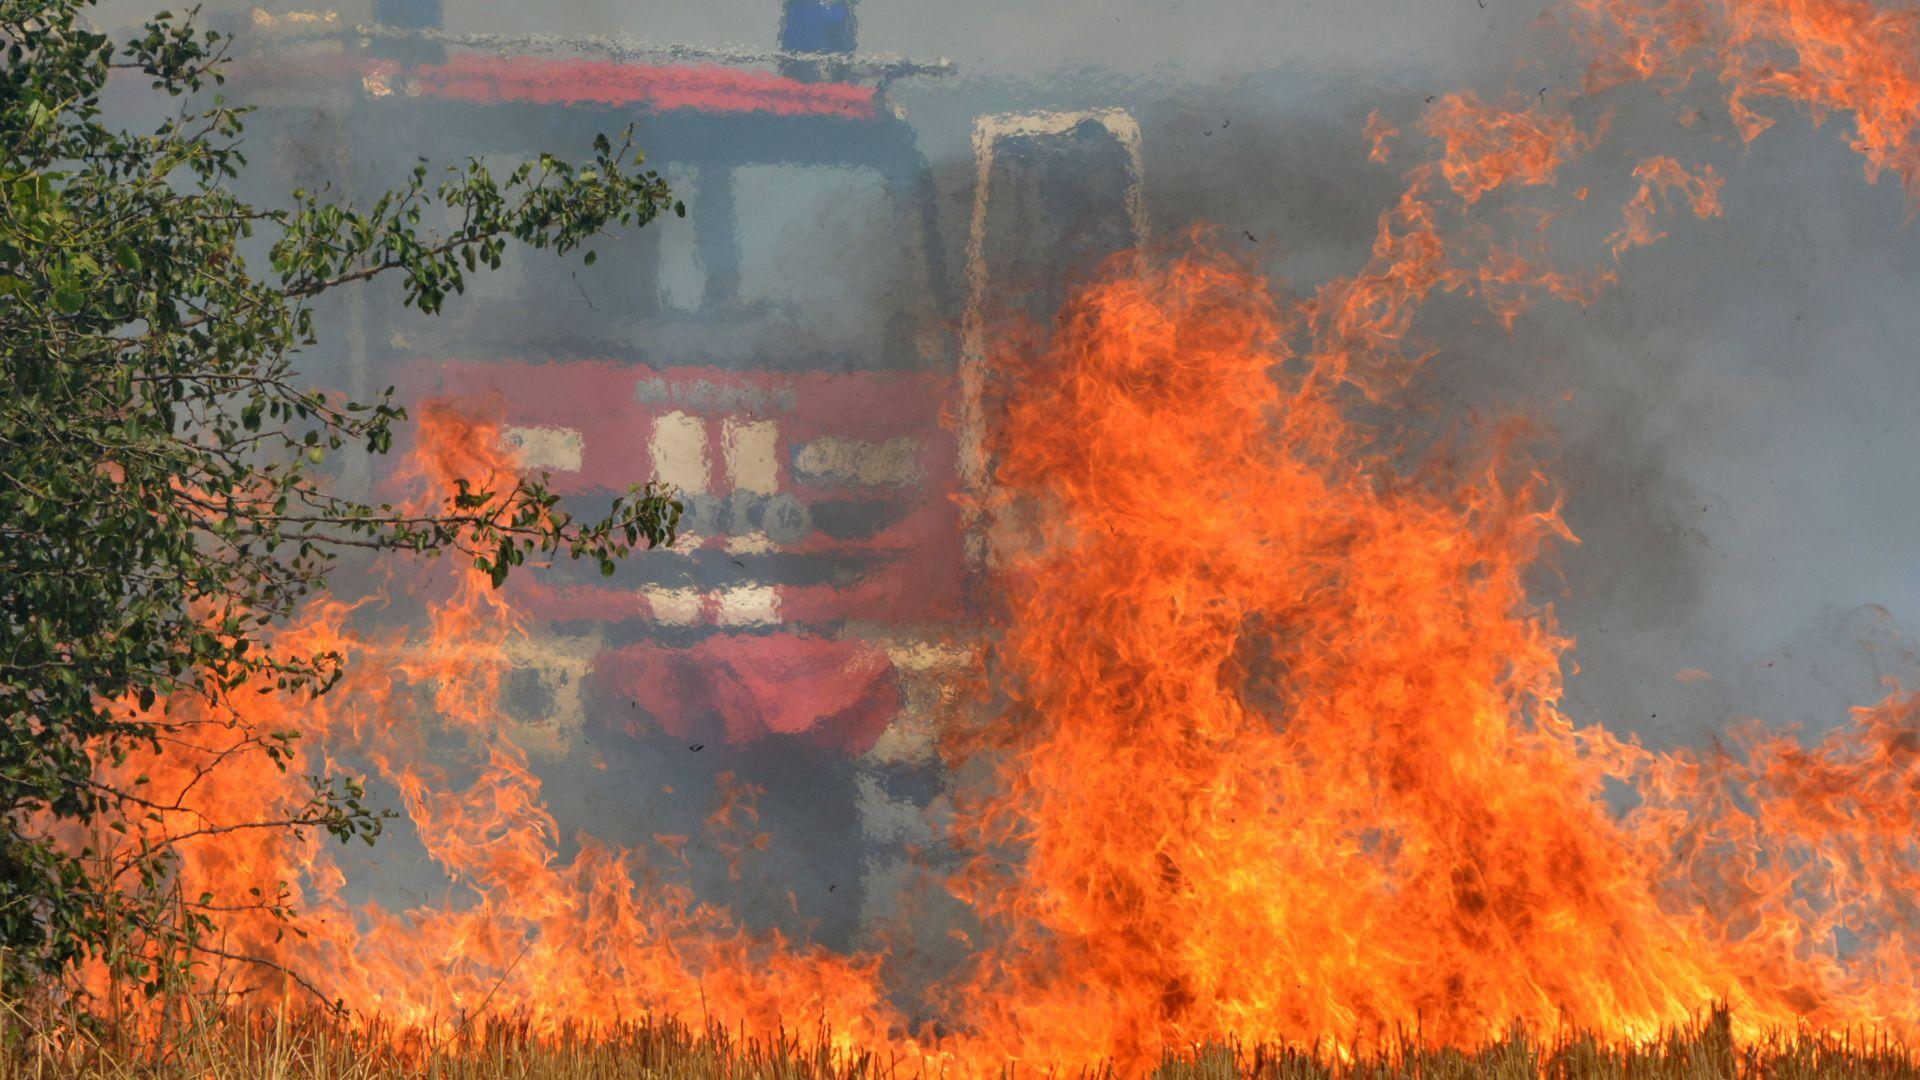 Шестчленно семейство от Сопот остана без дом заради пожар (видео)